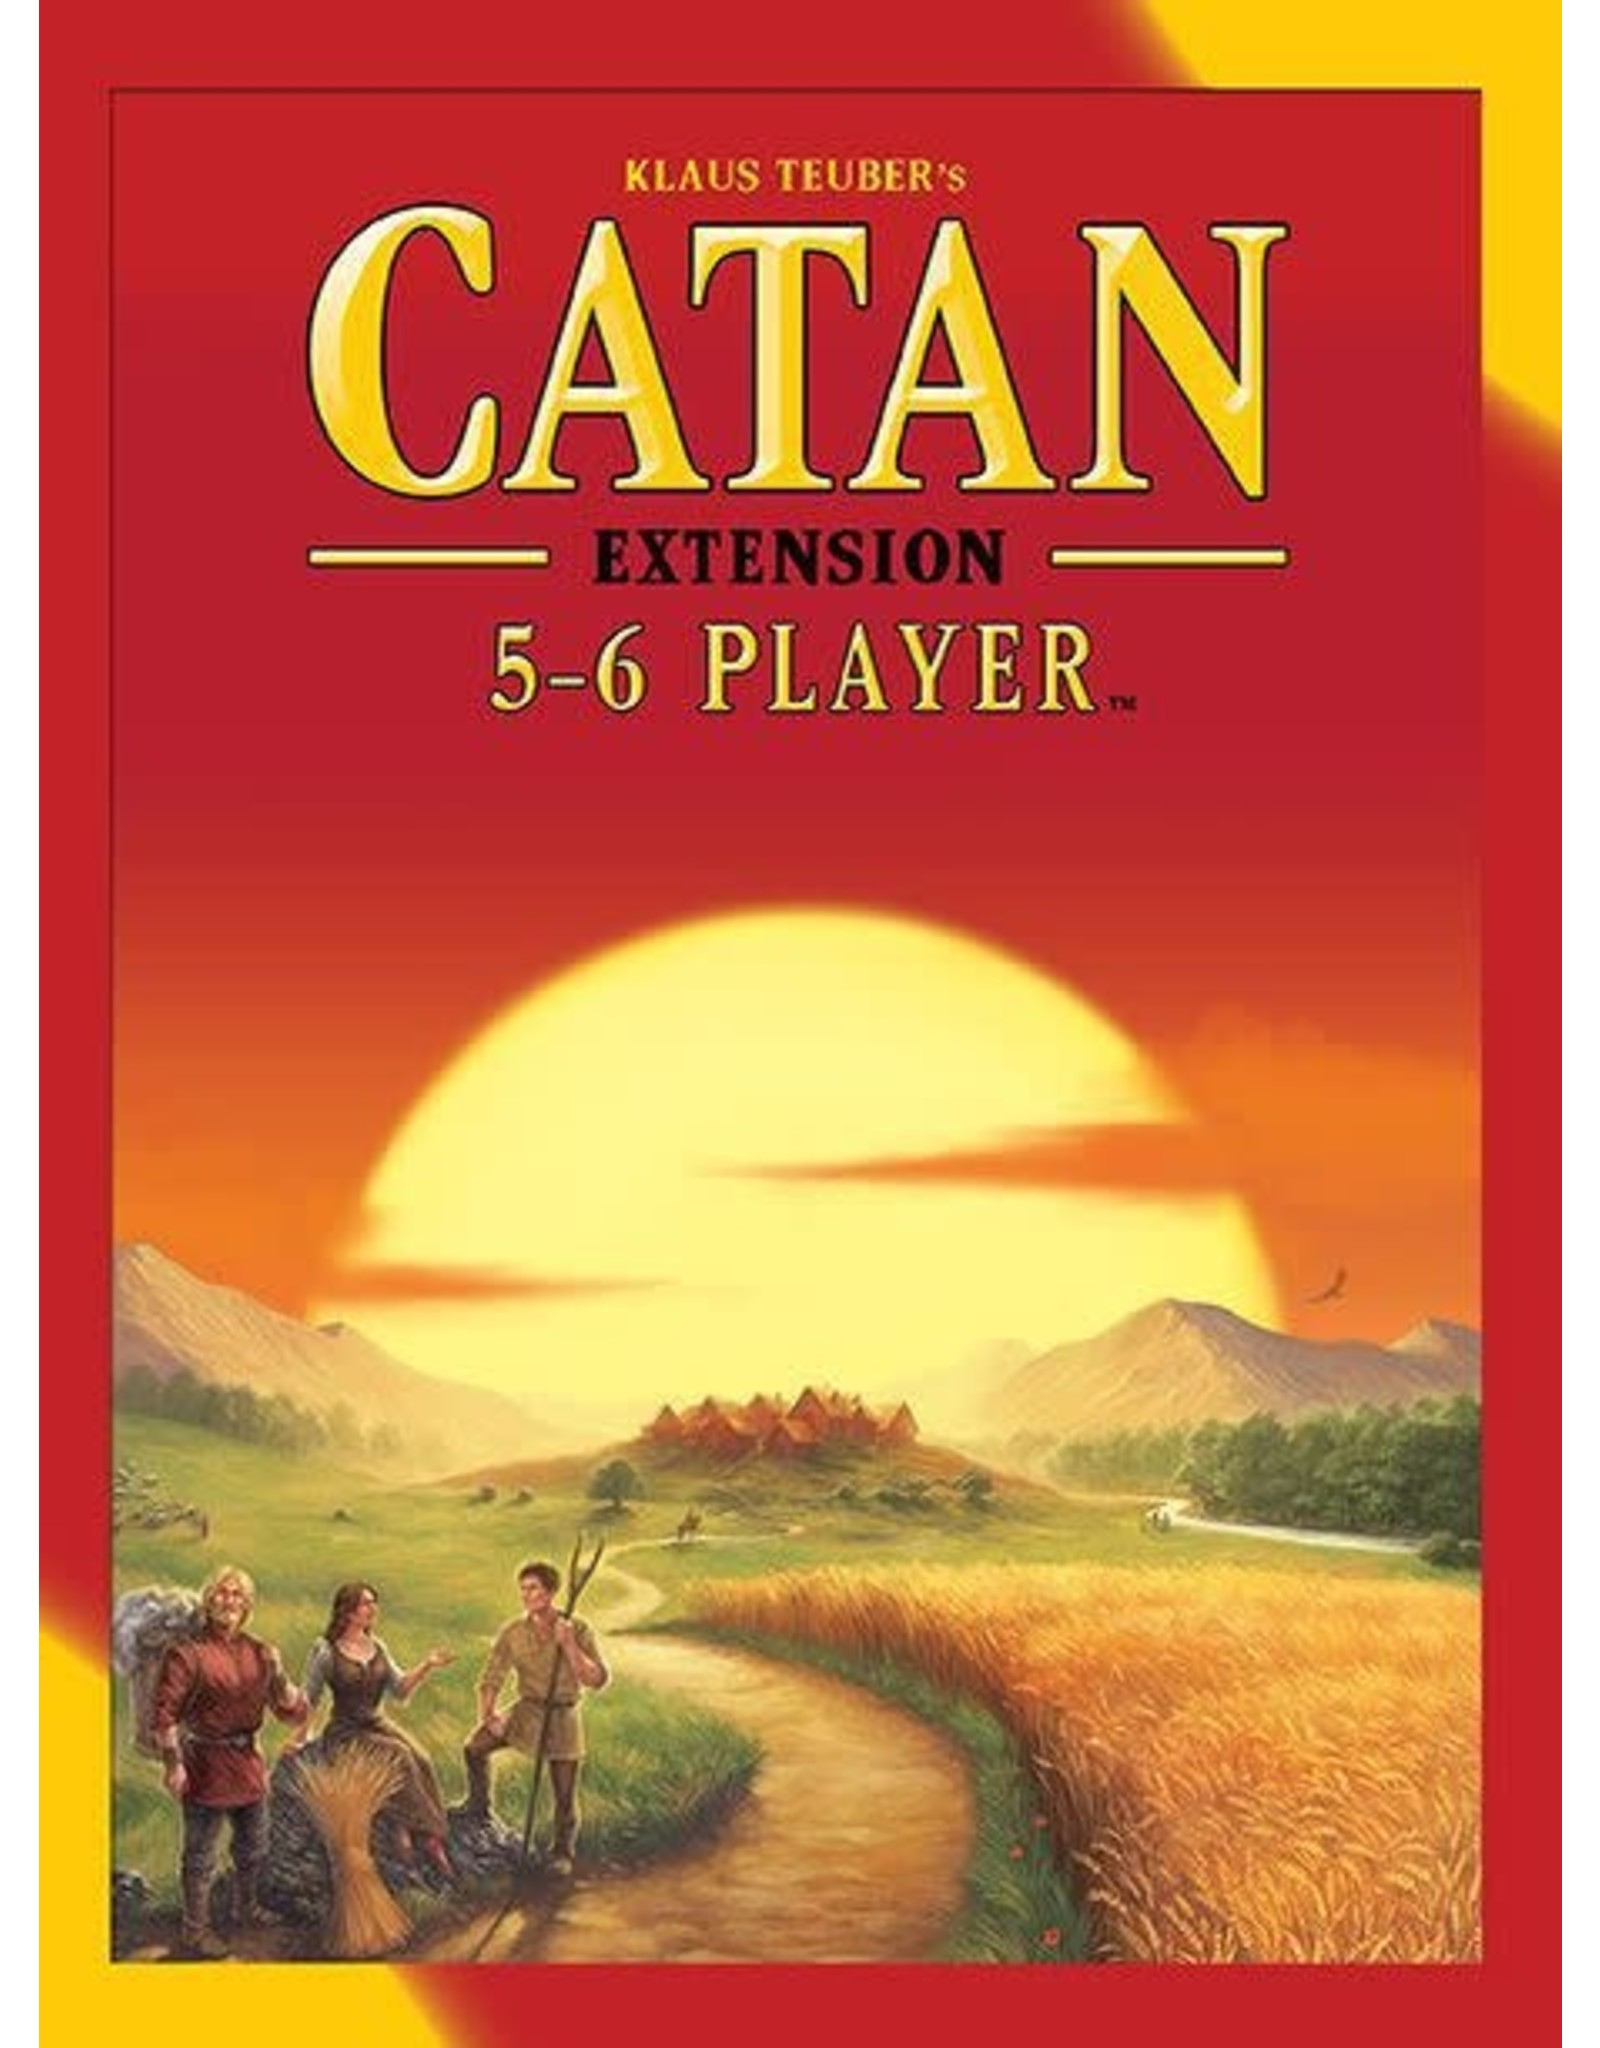 Catan Studio Catan 5 to 6 Player Extension